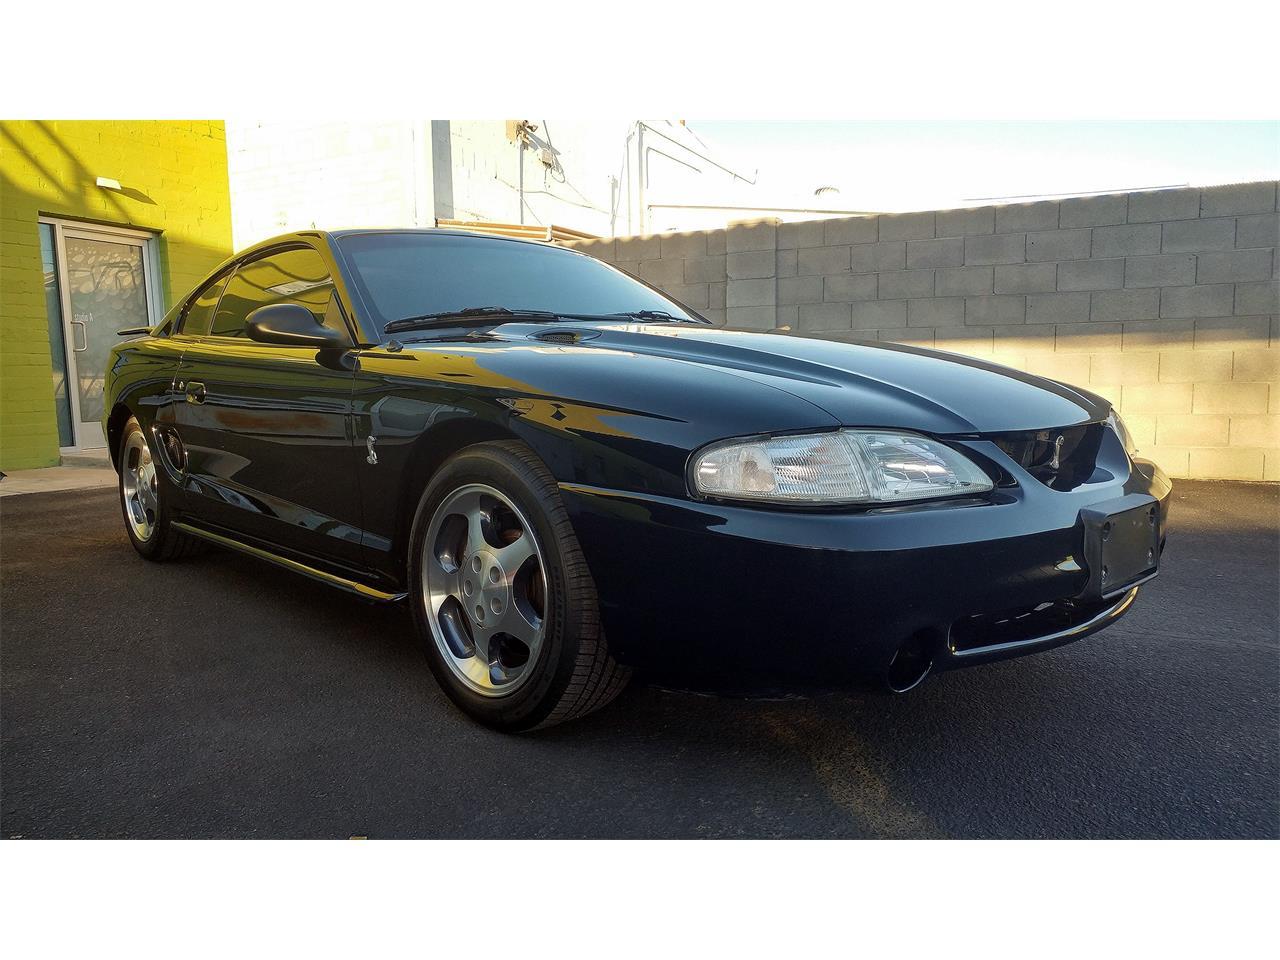 For sale 1994 ford mustang svt cobra in phoenix arizona